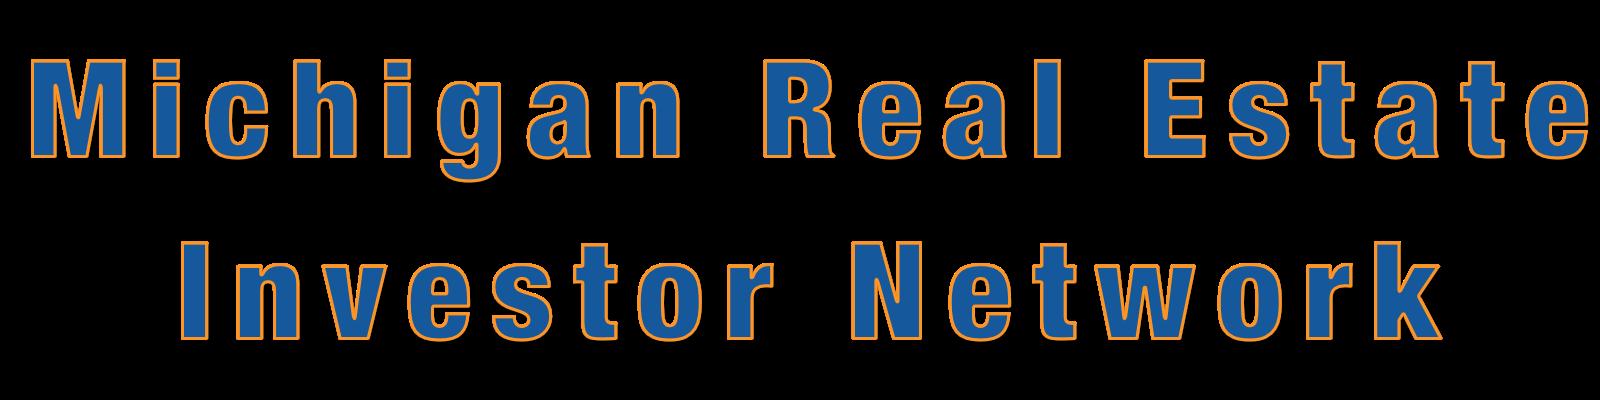 Michigan Real Estate Investor Network